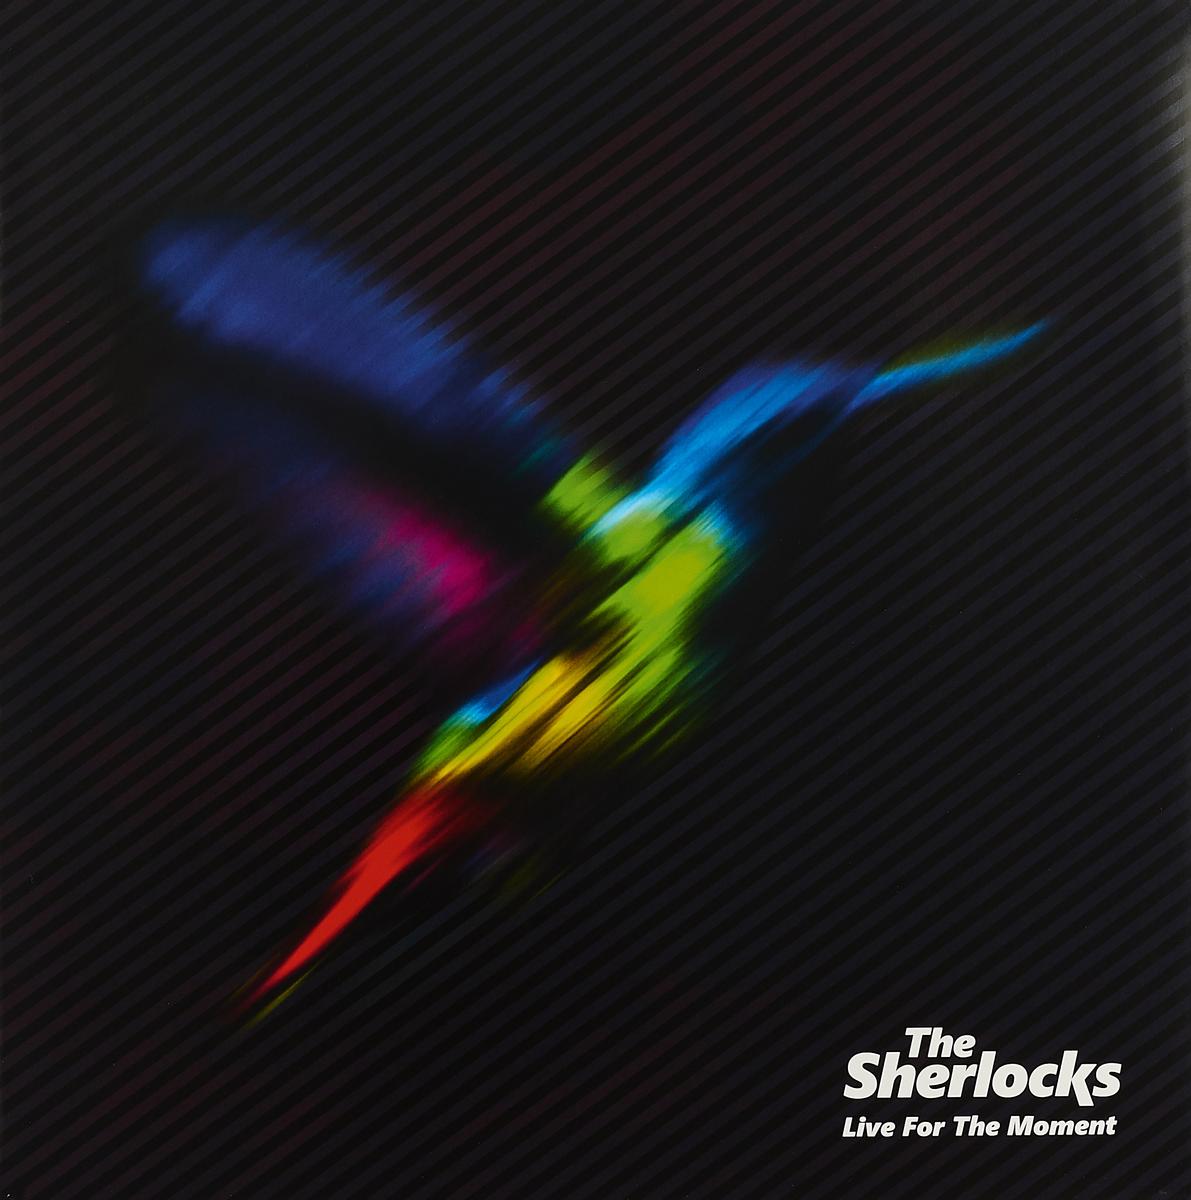 The Sherlocks The Sherlocks. Live For The Moment (LP) the sherlocks köln